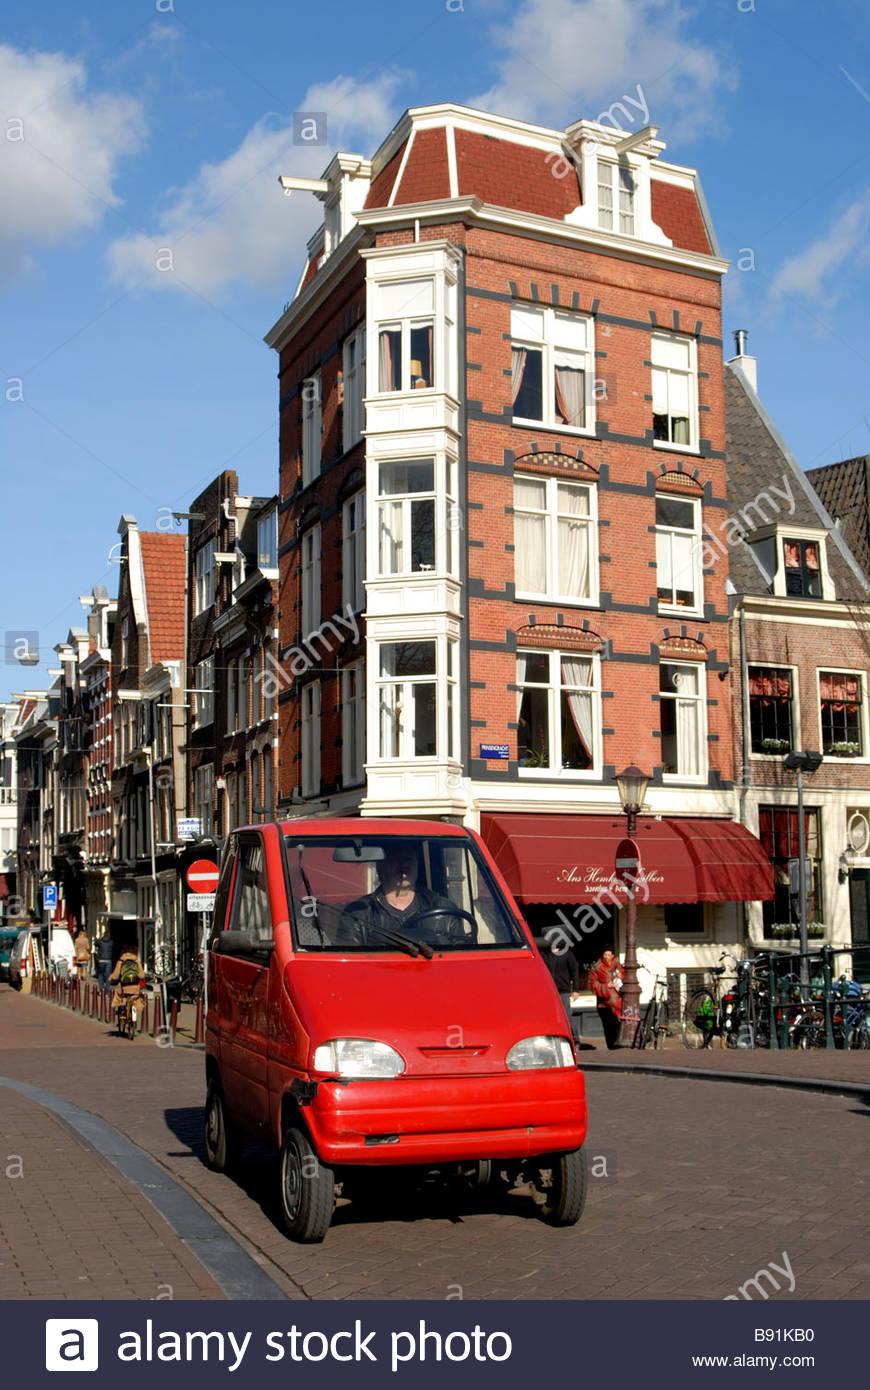 Amsterdam A Red Canta Car Crosses A Bridge On The Prinsengracht